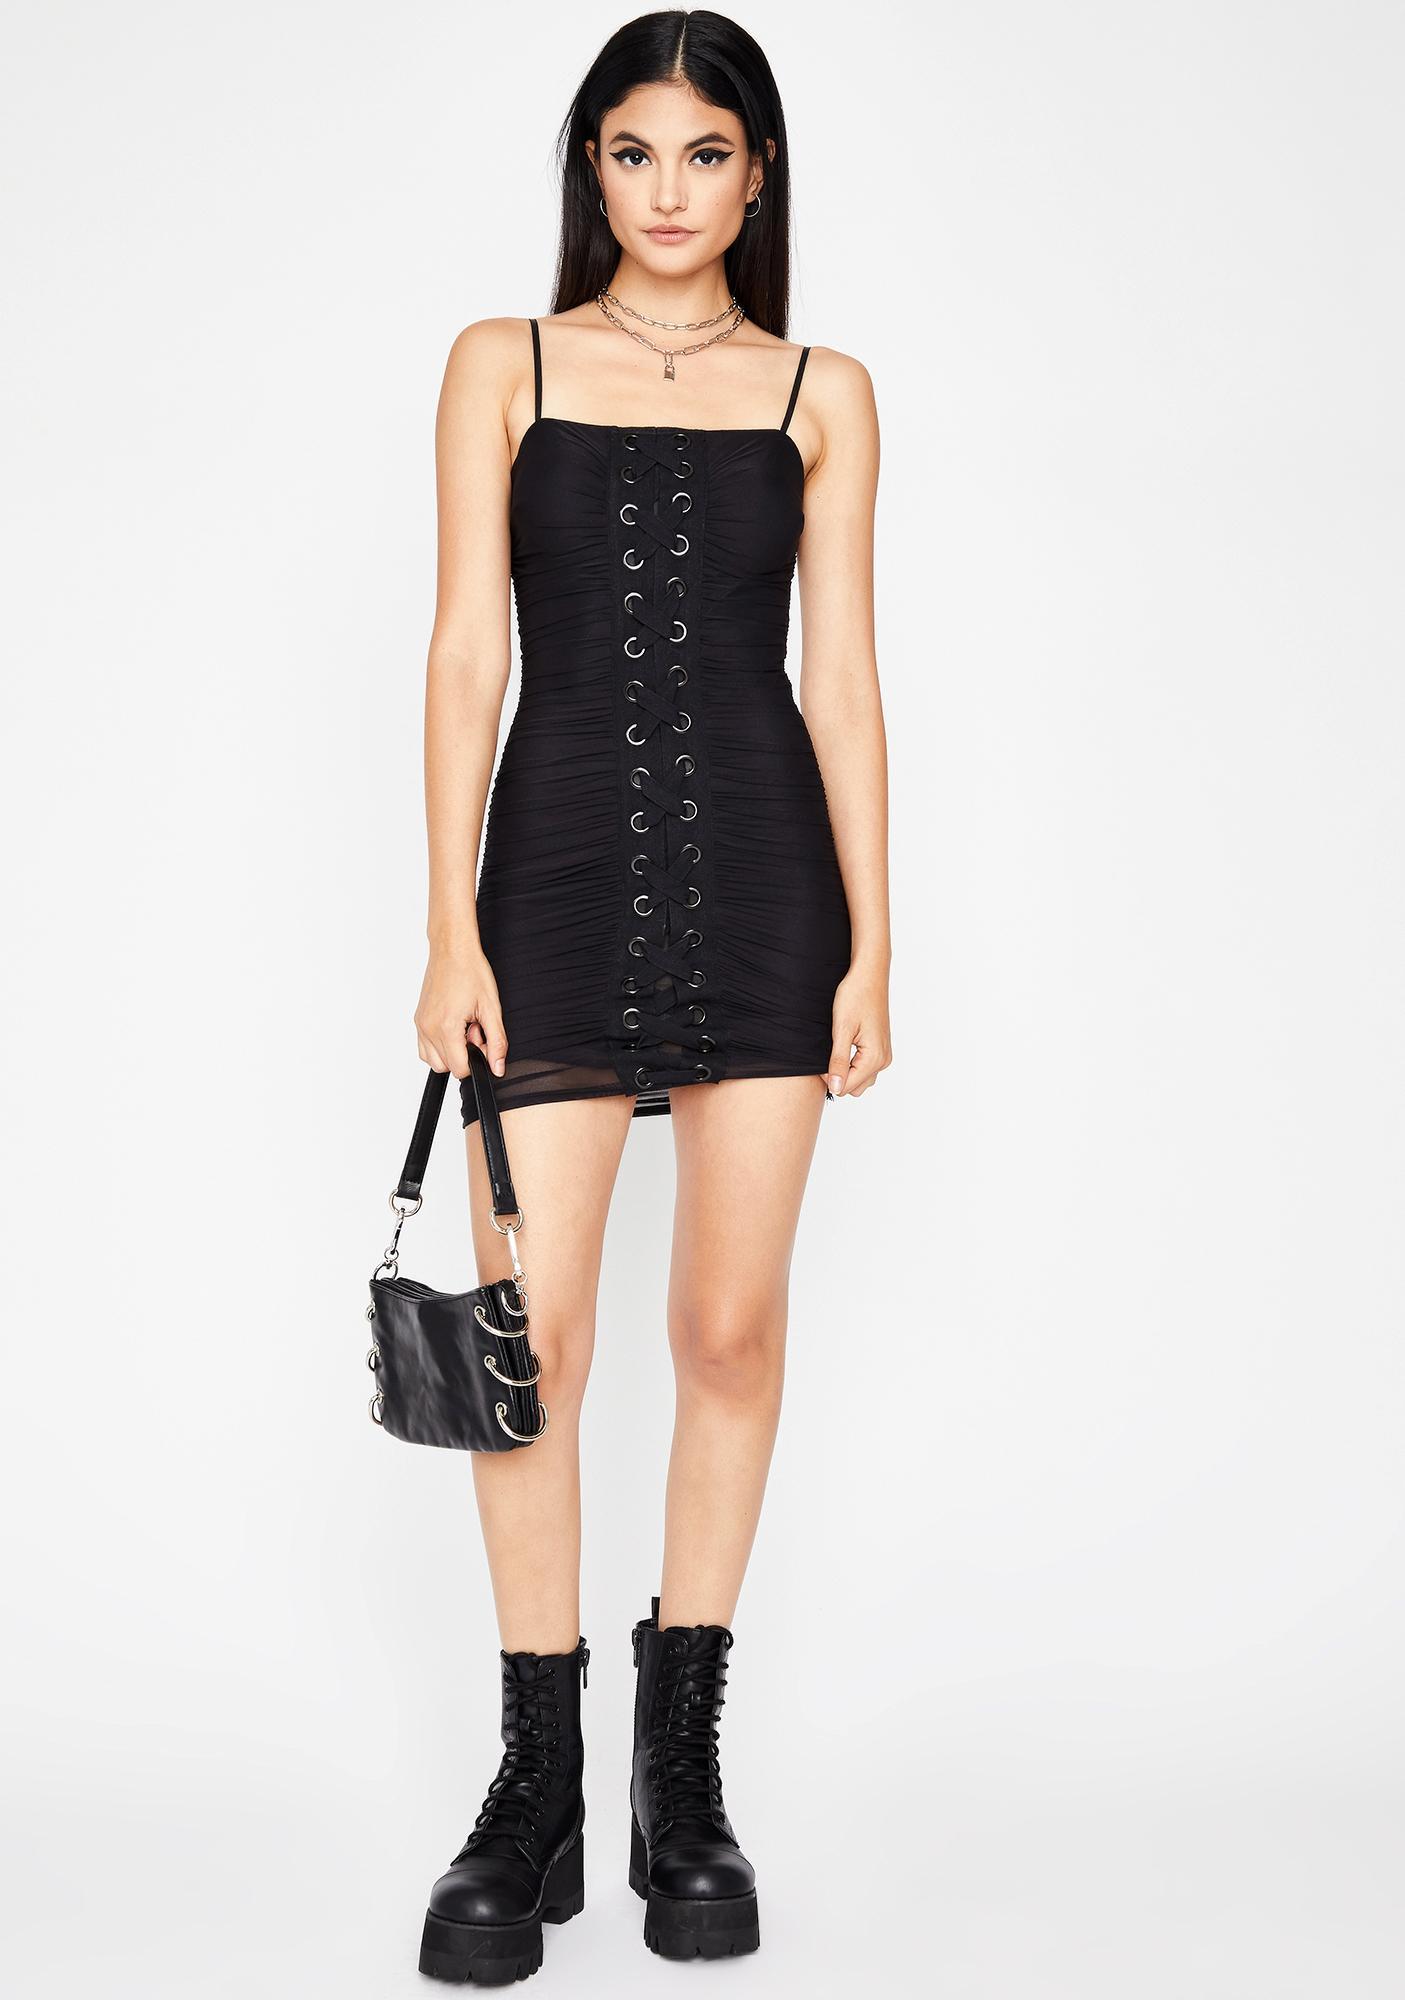 Diabolical Diva Lace Up Dress